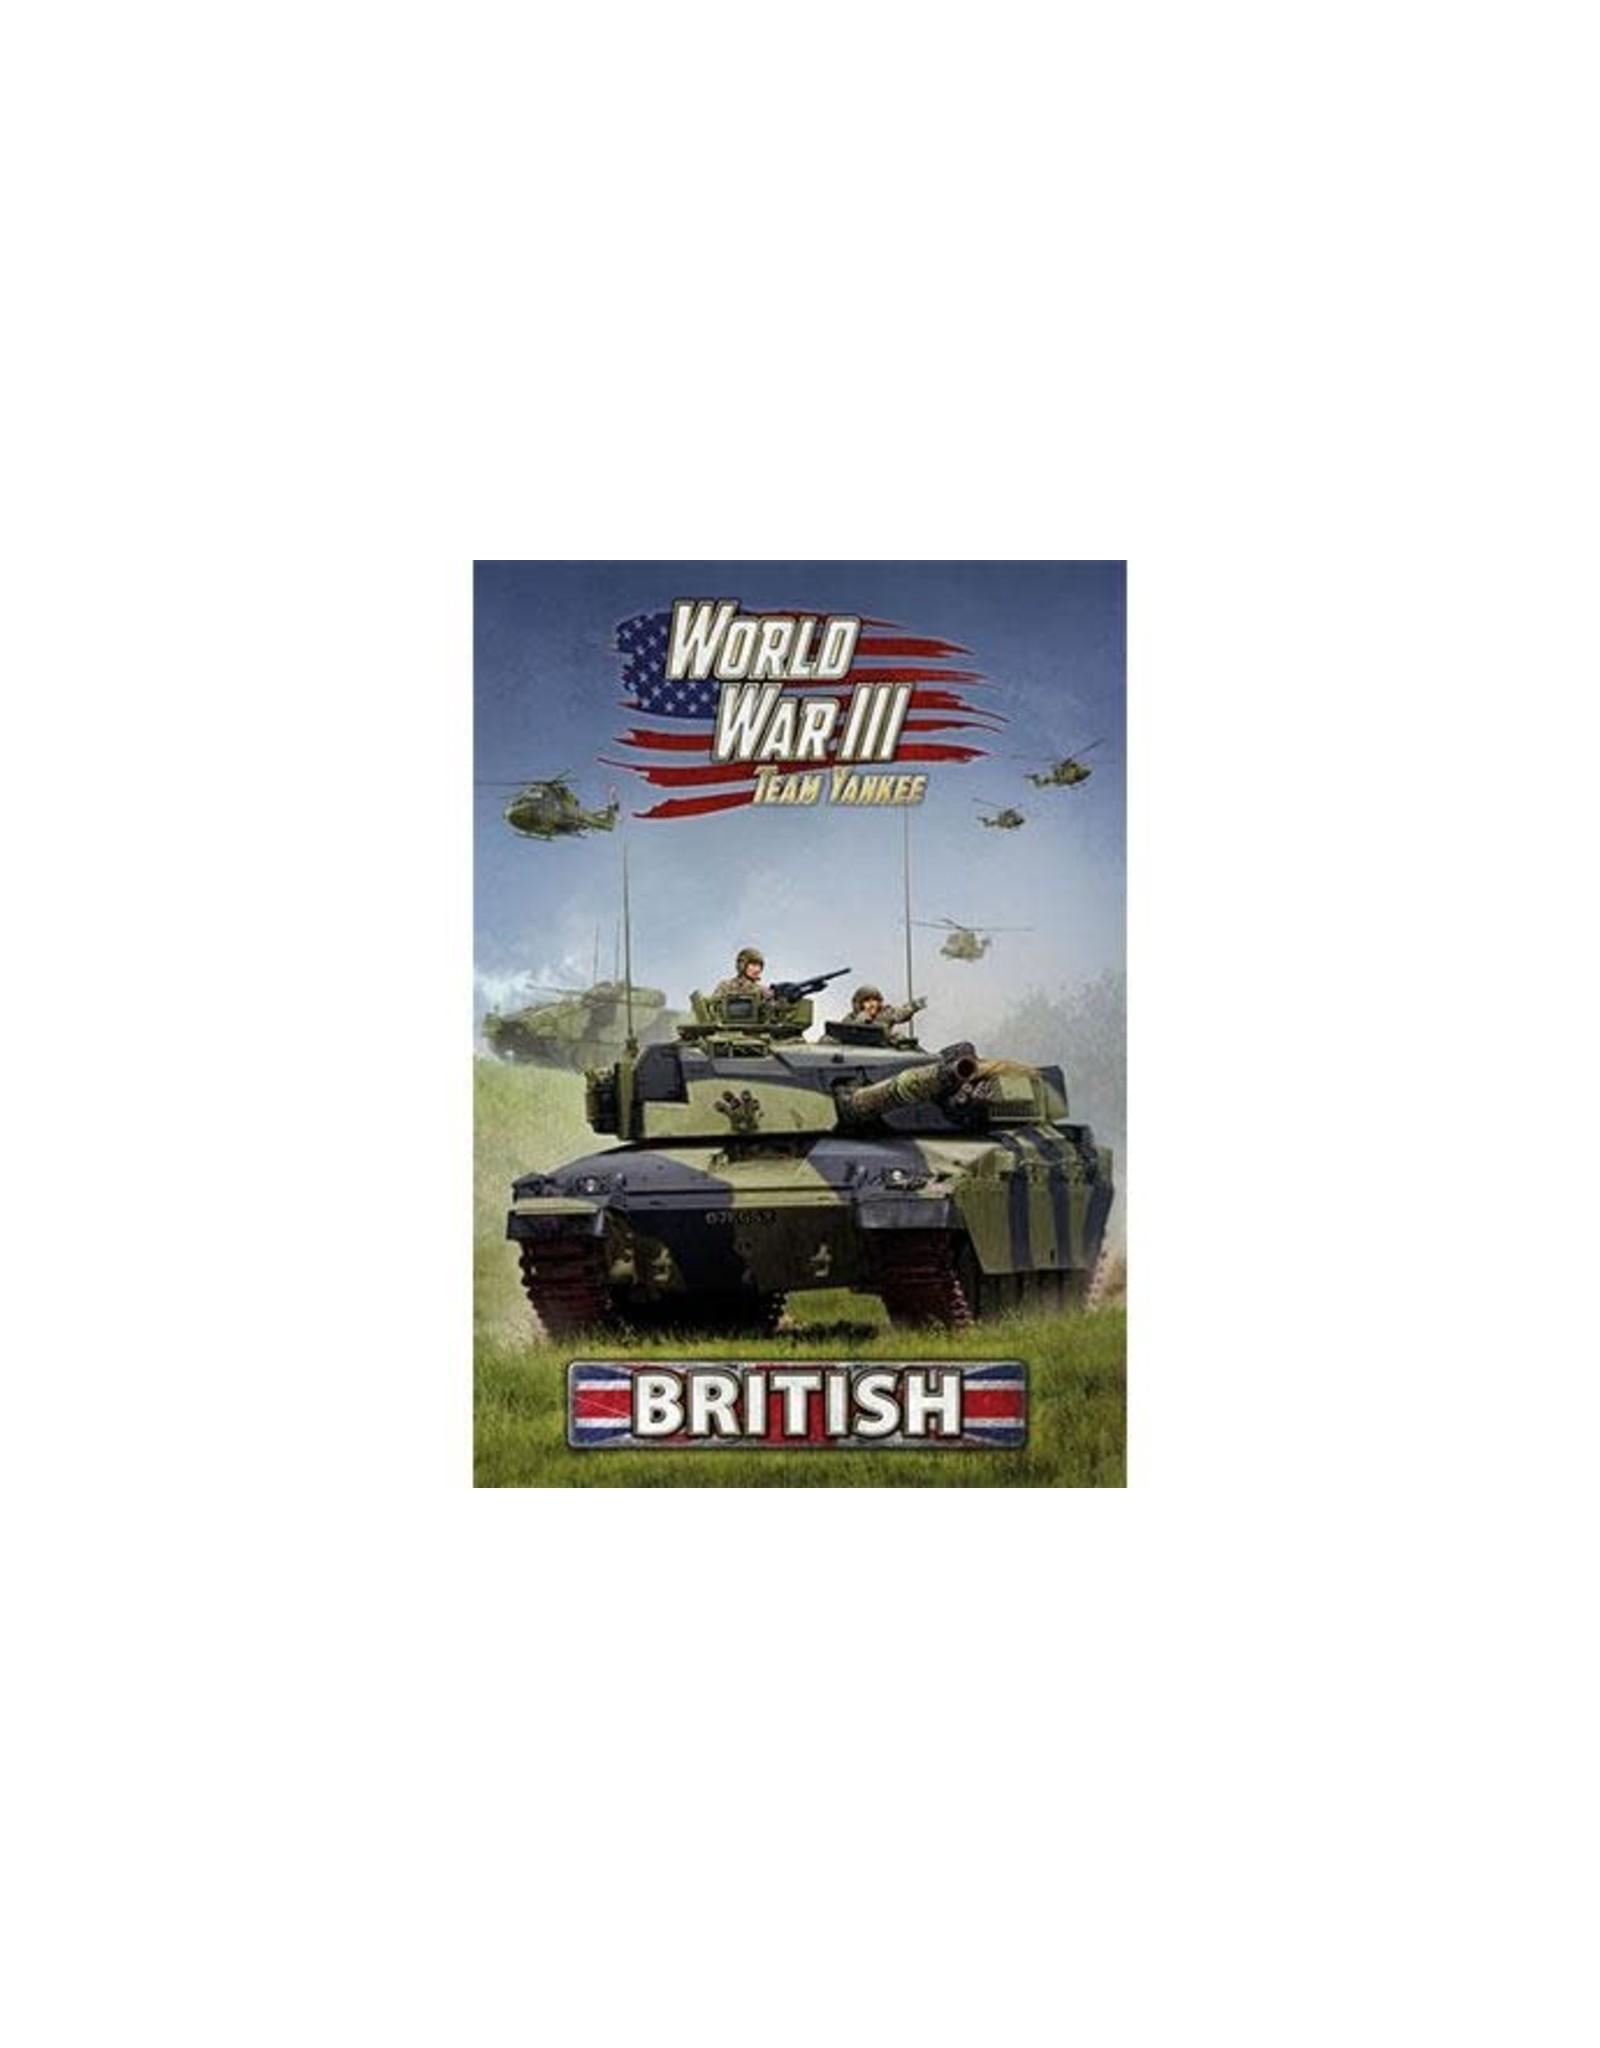 Team Yankee World War III: British Rulebook